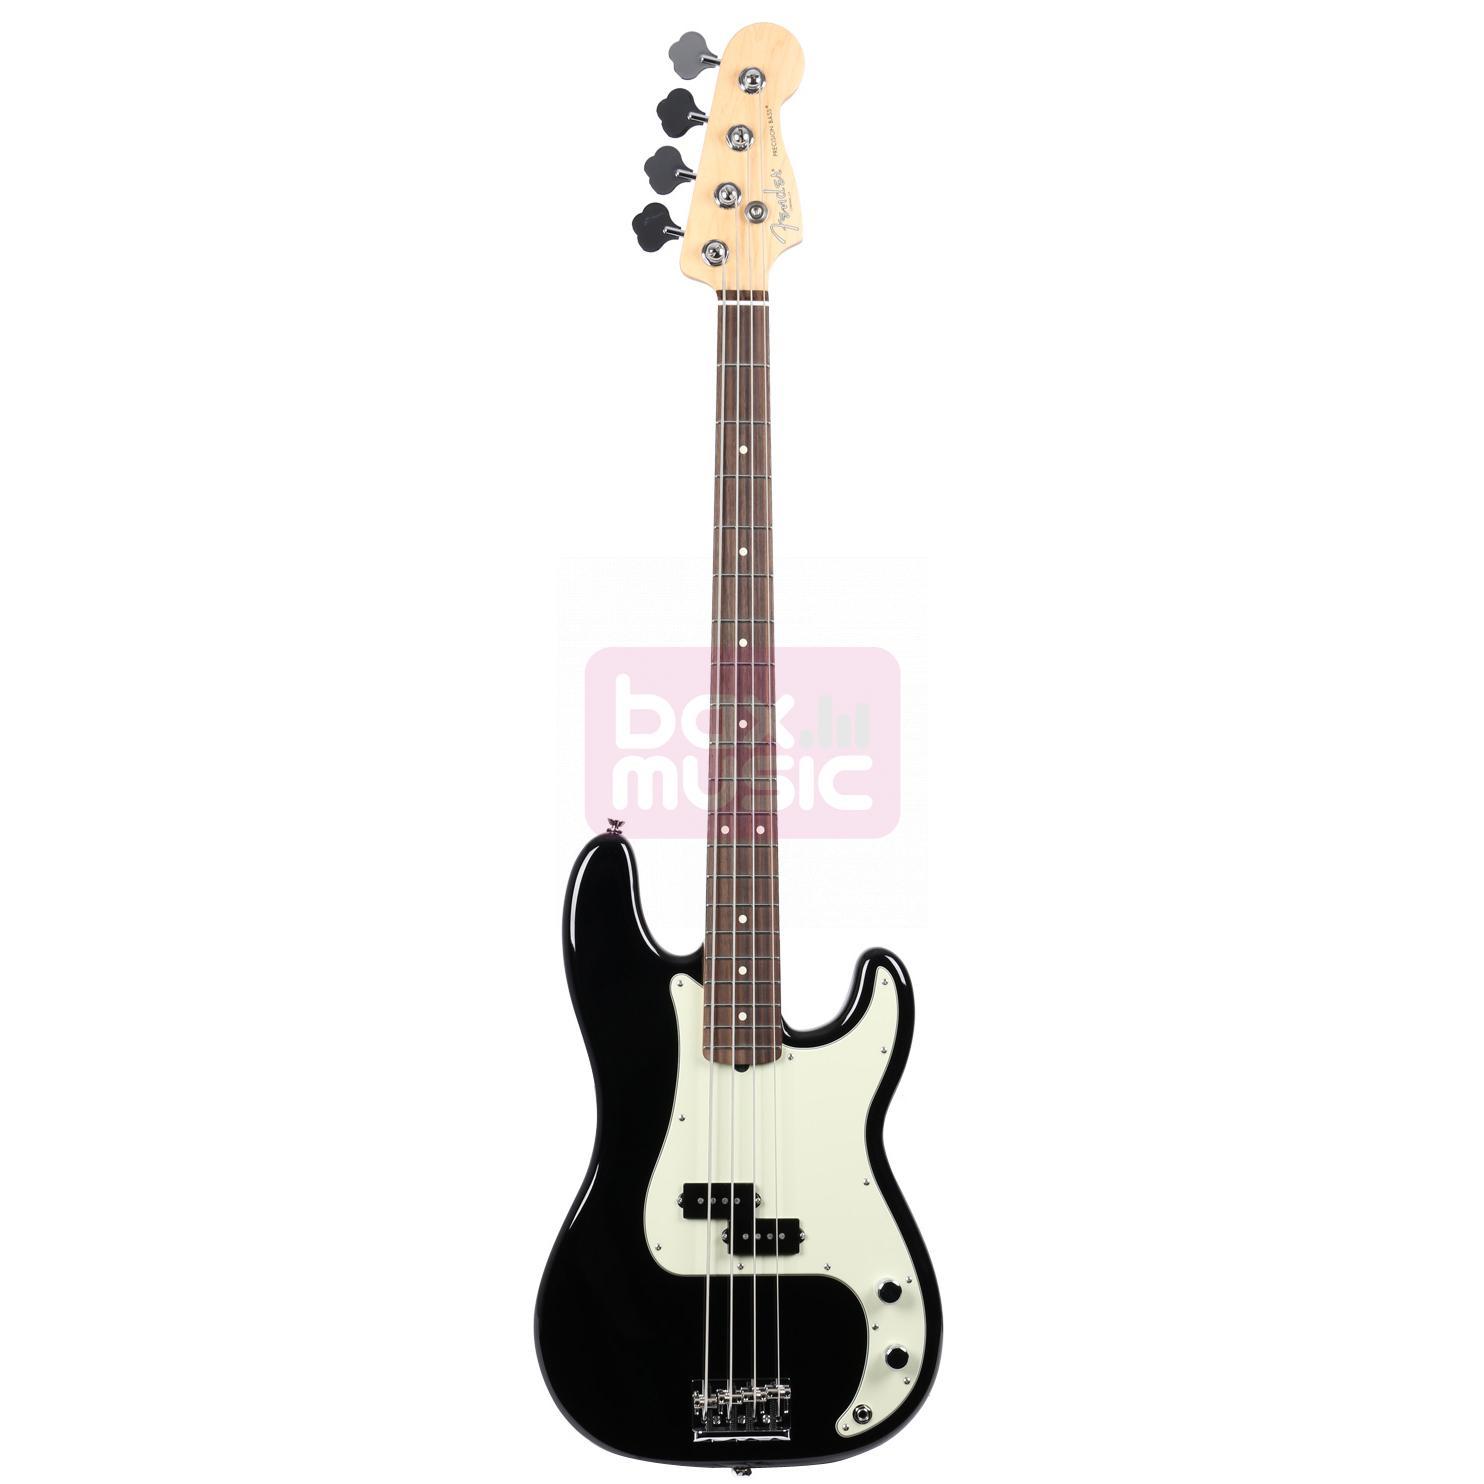 Fender American Professional Precision Bass Black RW